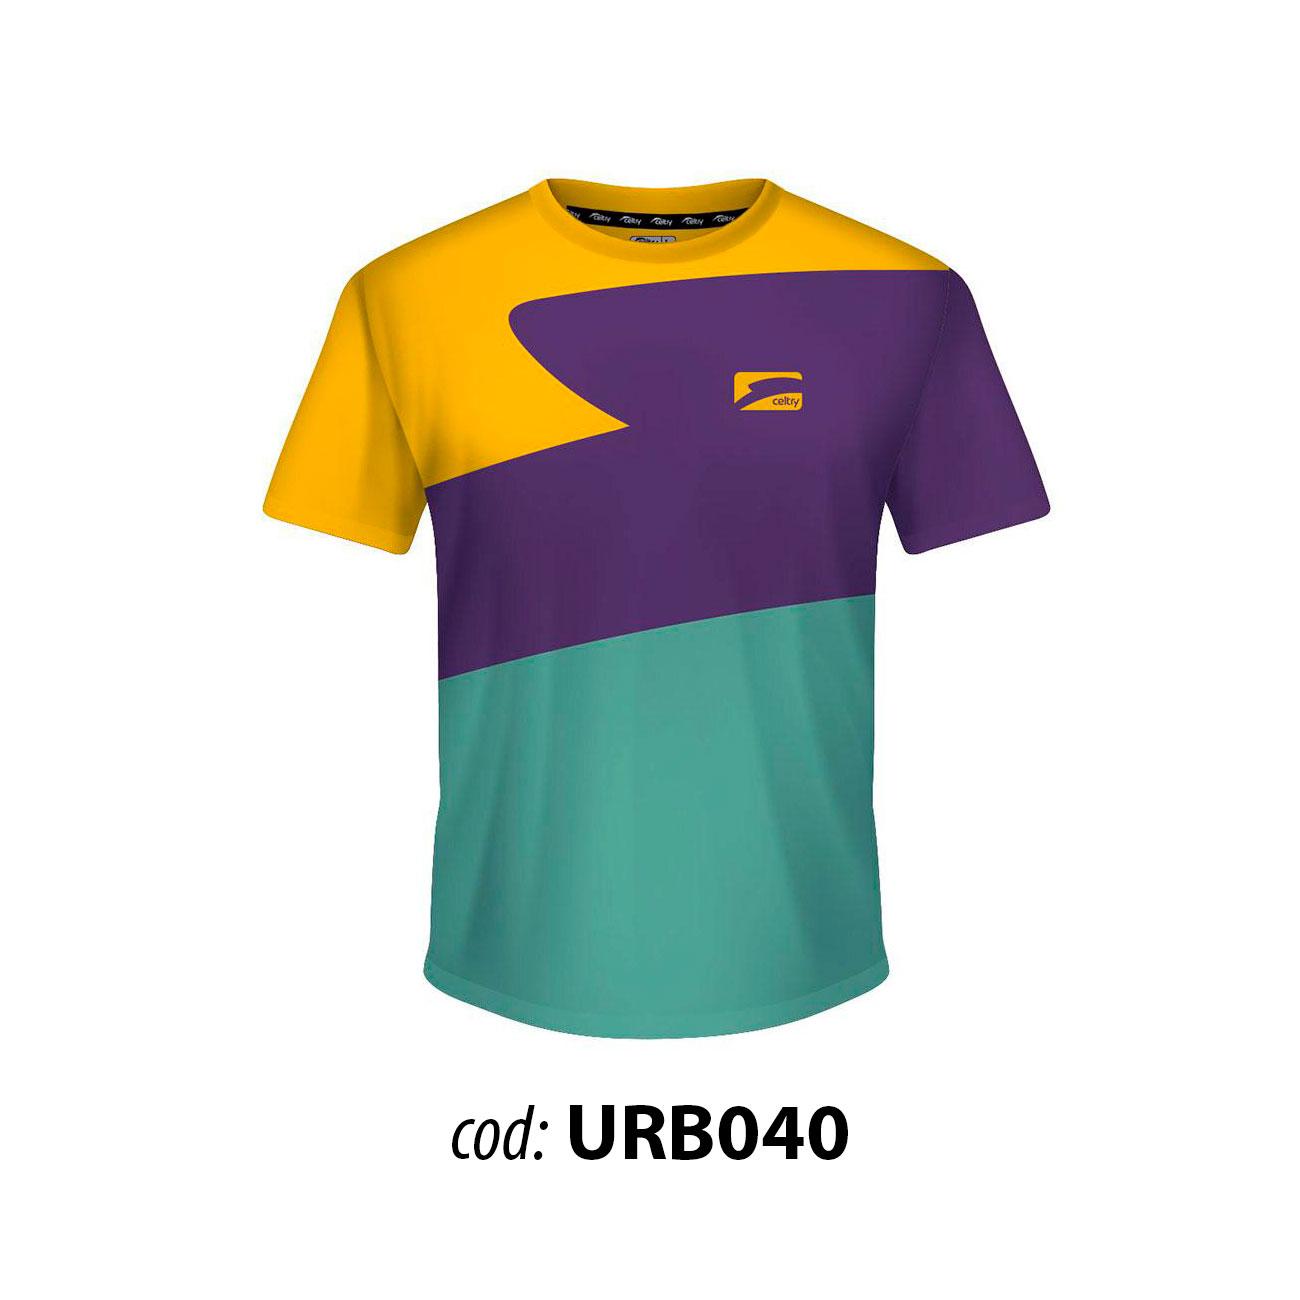 Polera polo   Urbana URB040